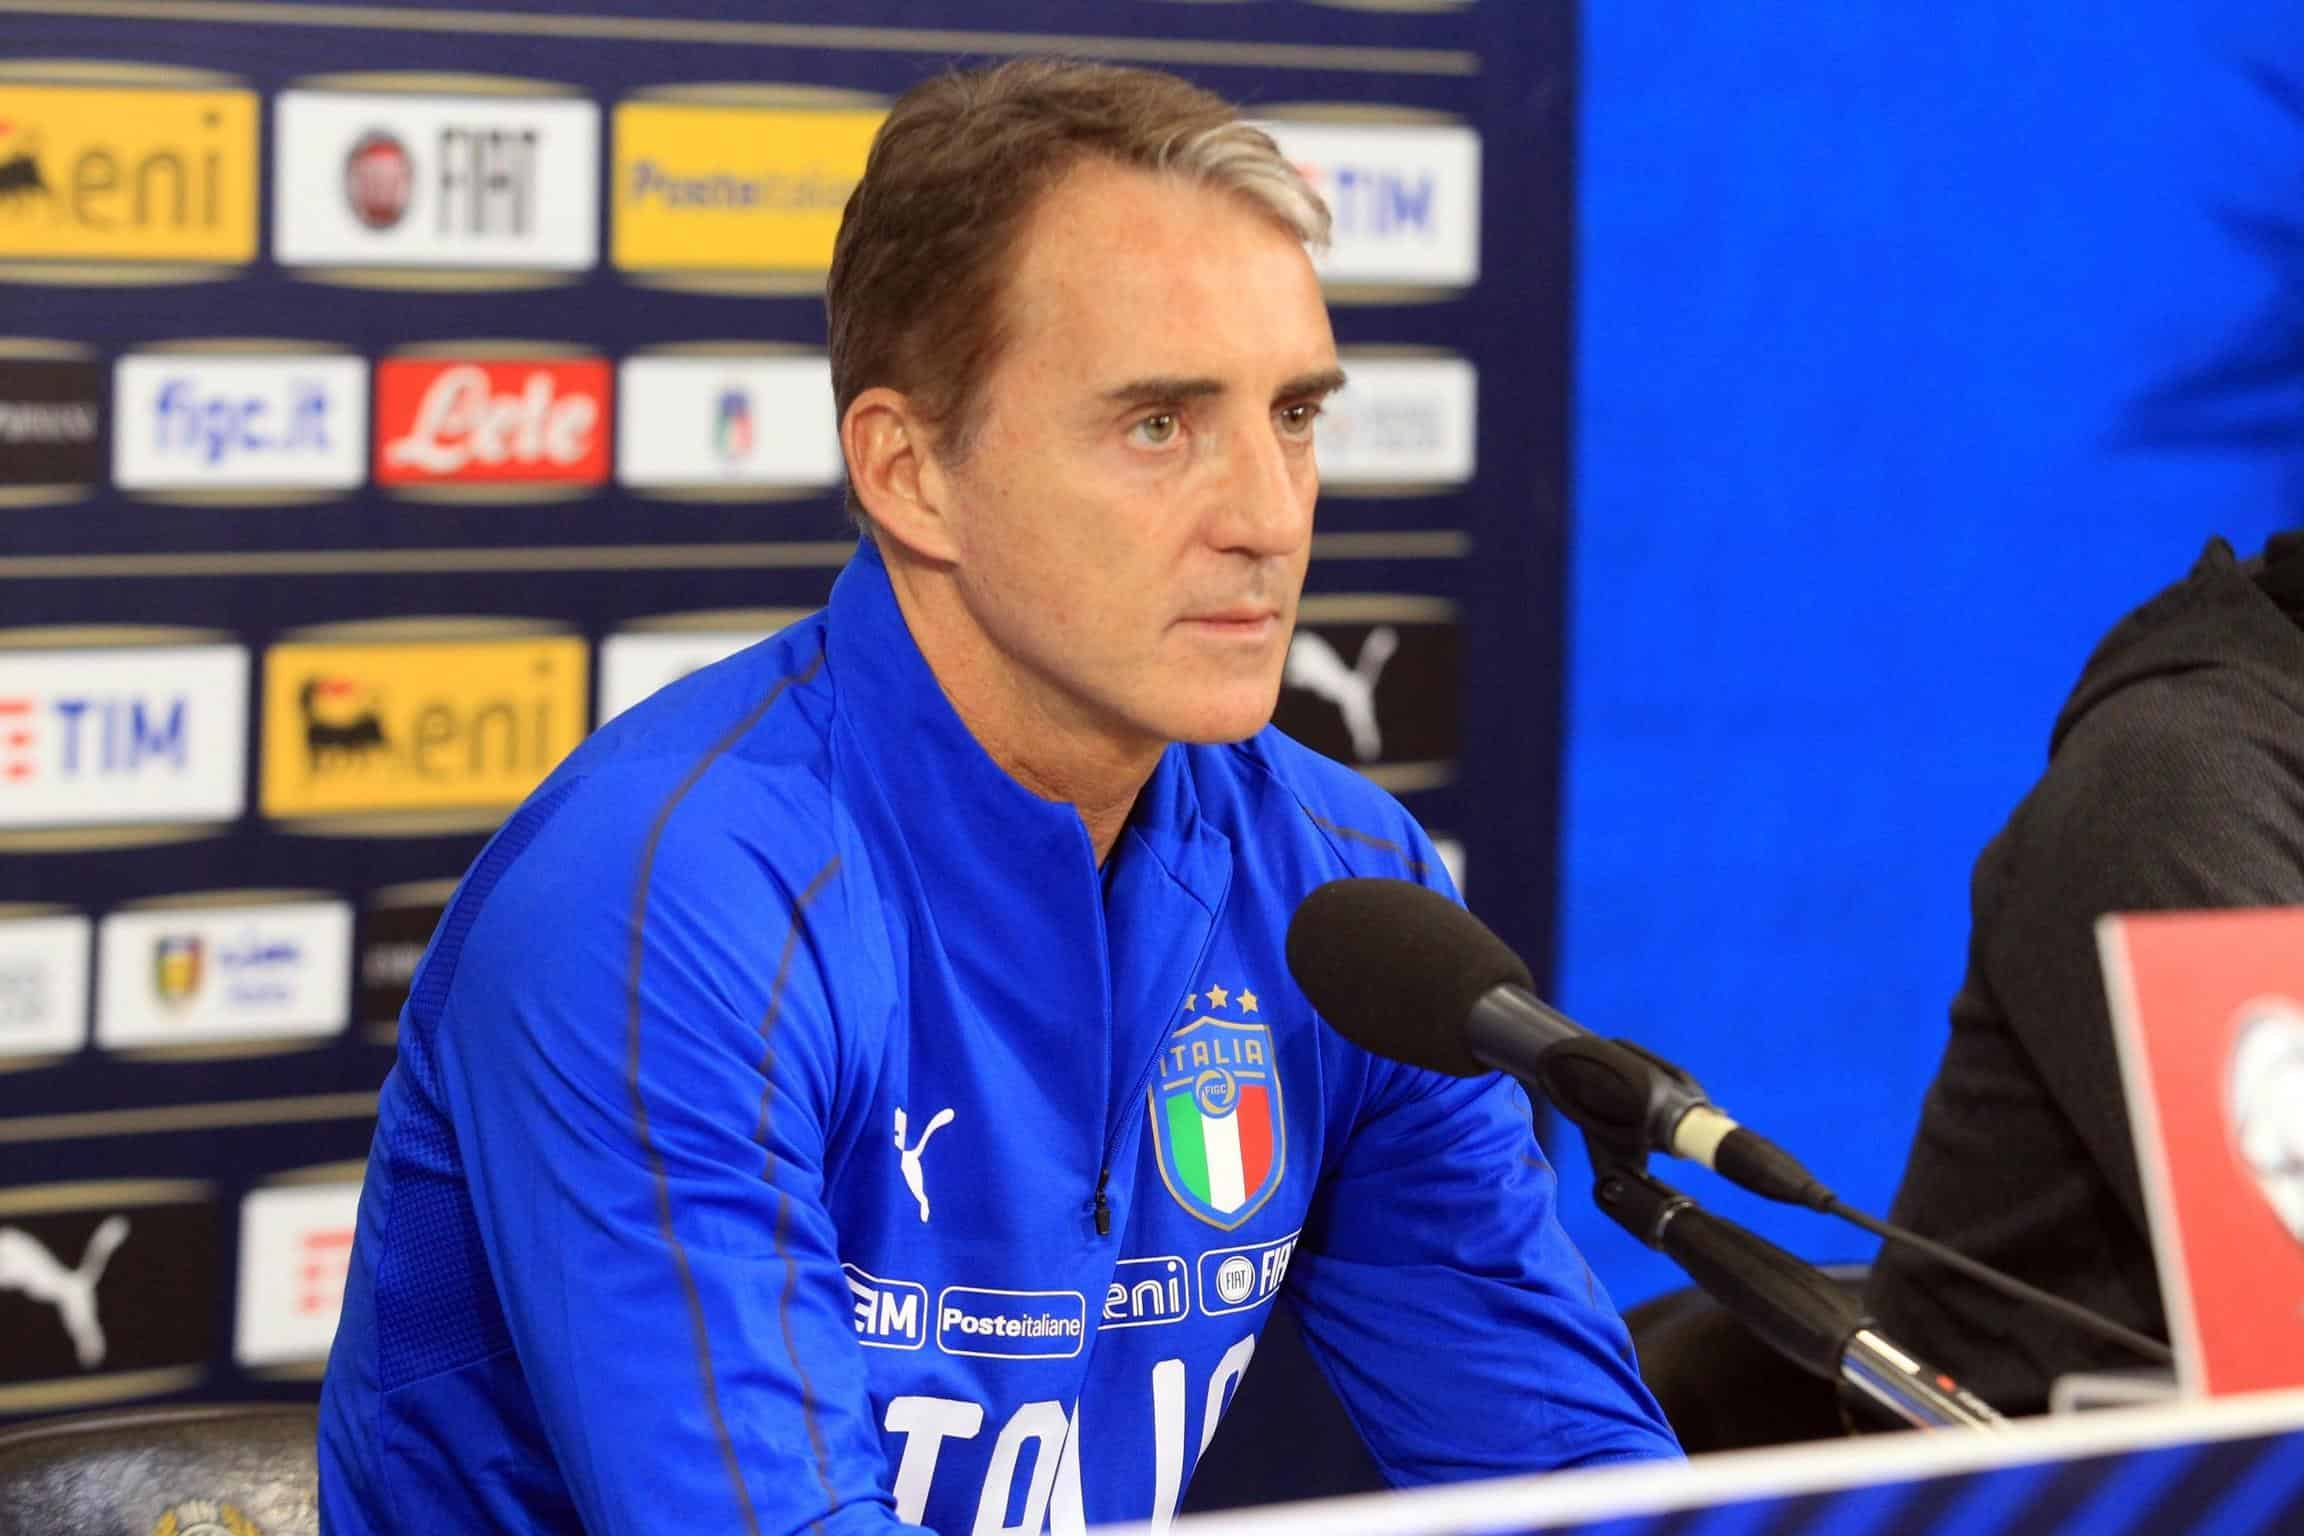 qualificazioni mondiali 2022 Mancini